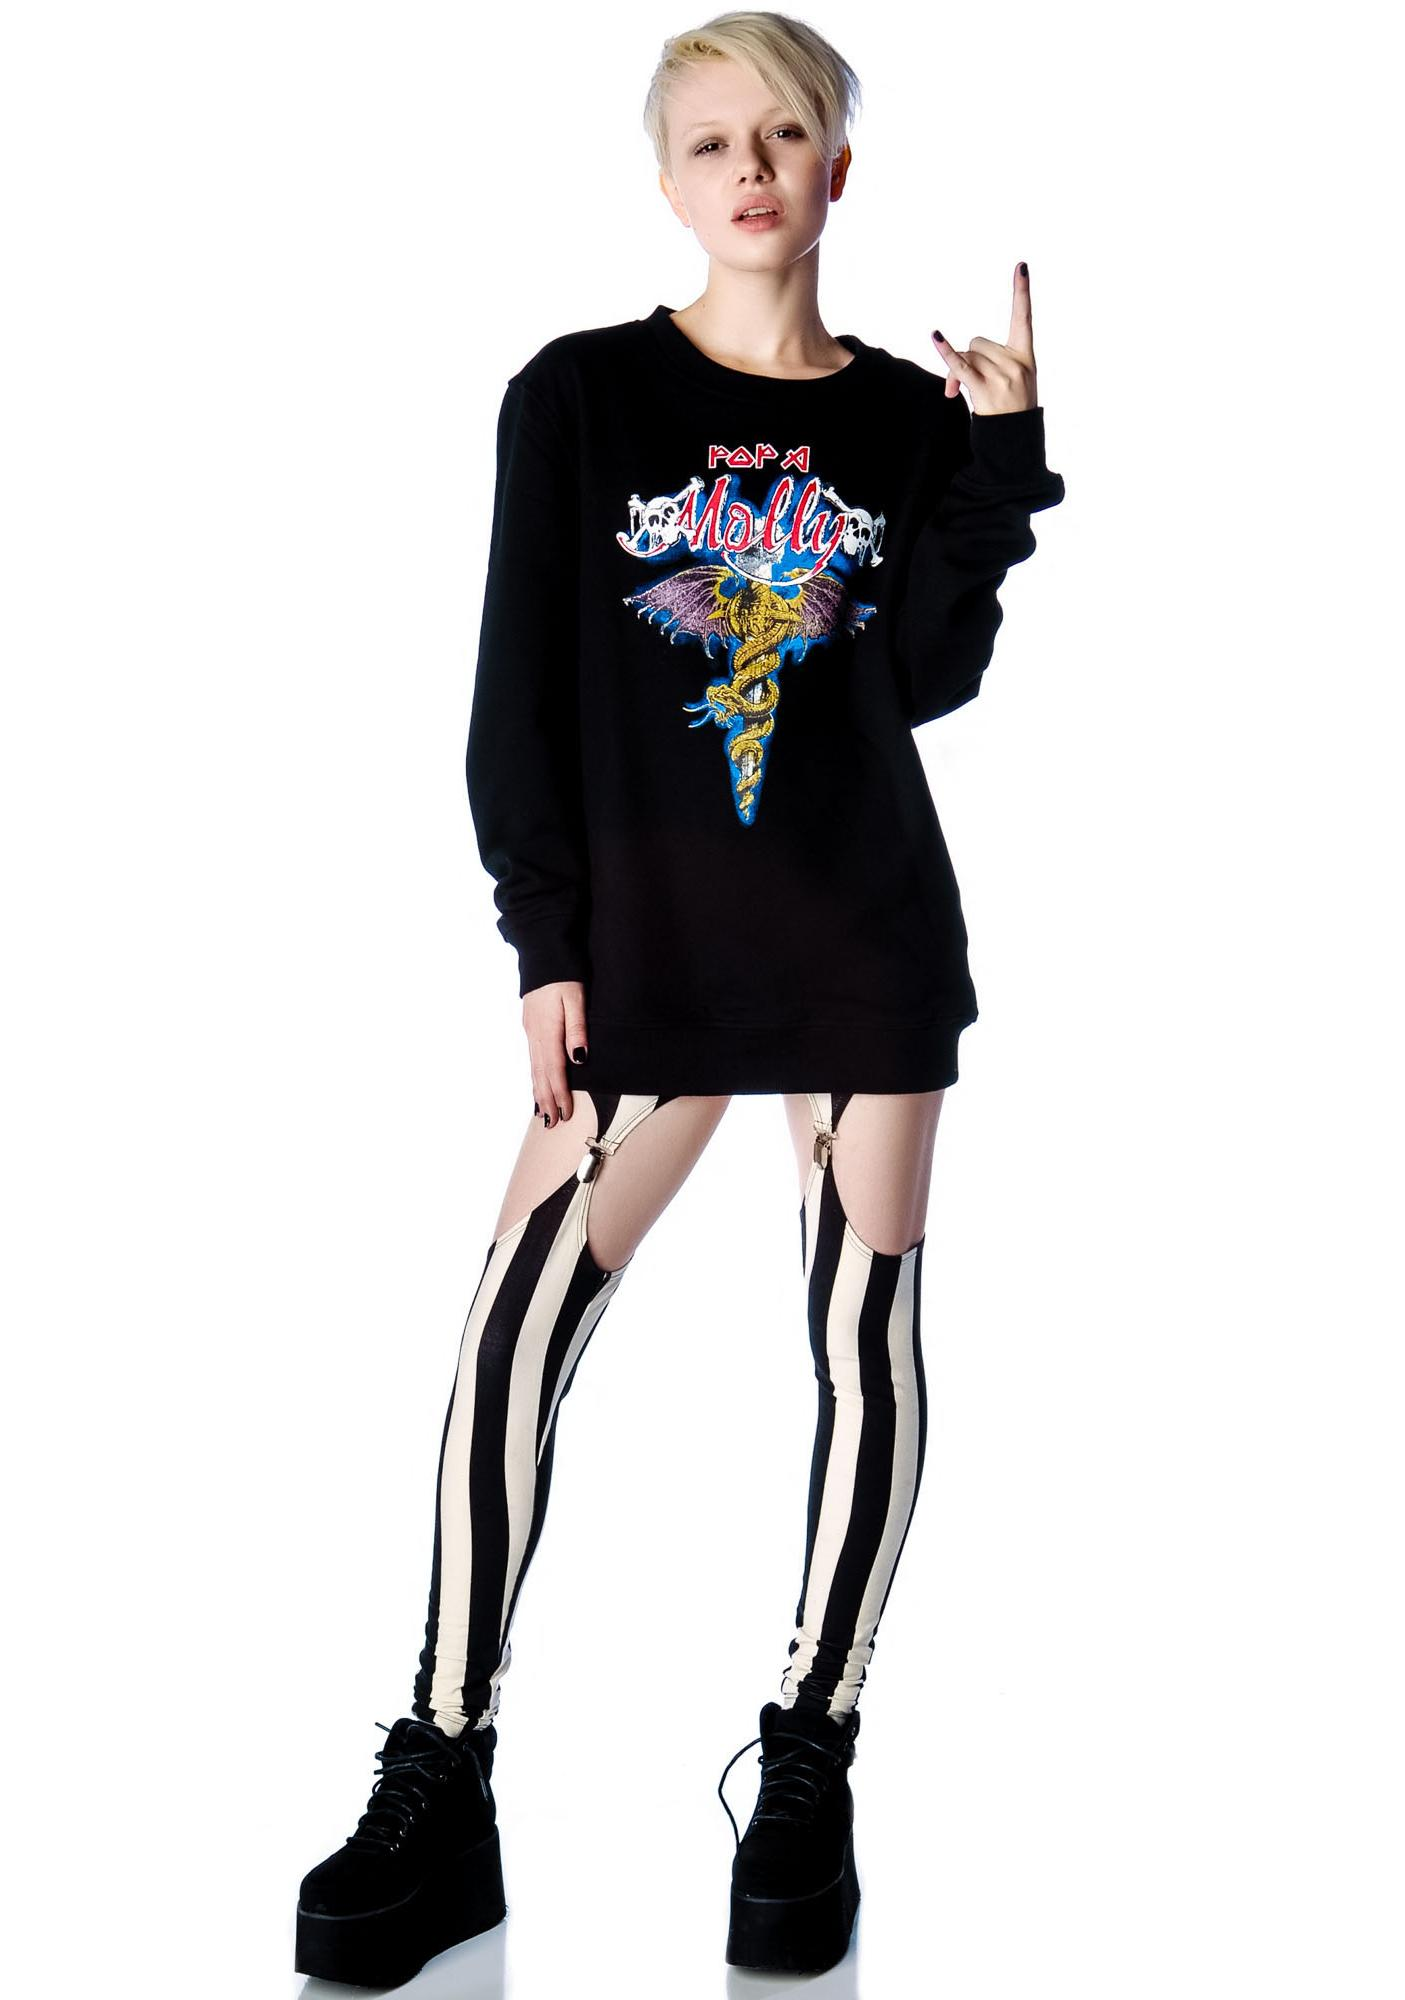 Pop a Molly Sweatshirt